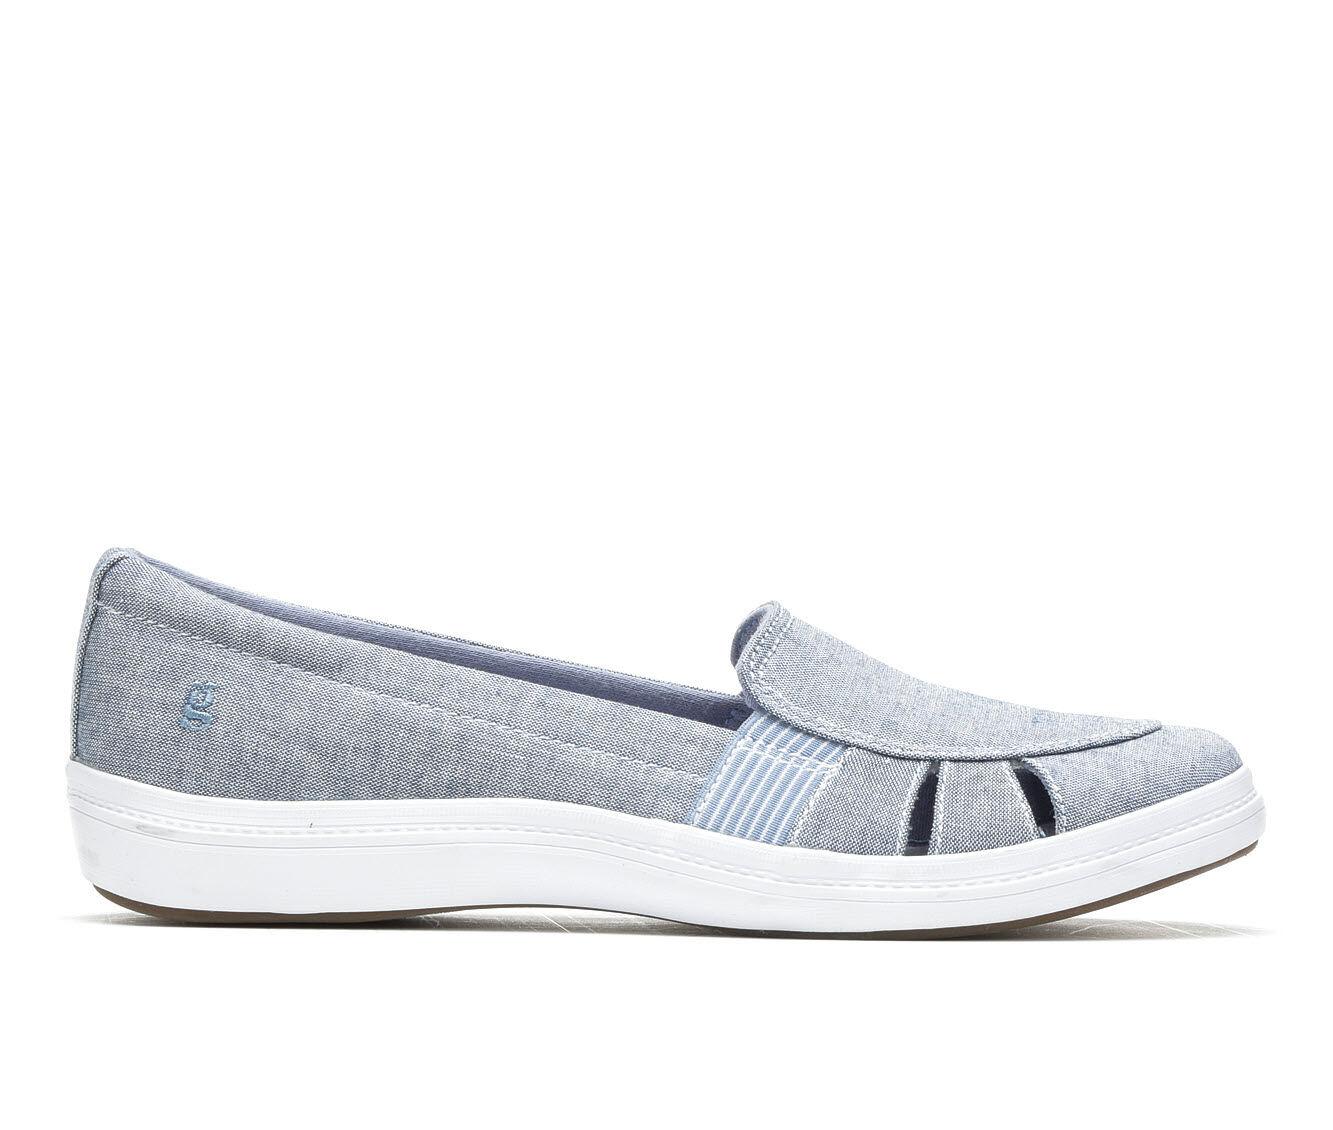 Women's Grasshoppers Janis Fisherman Shoes Stonewash Blue